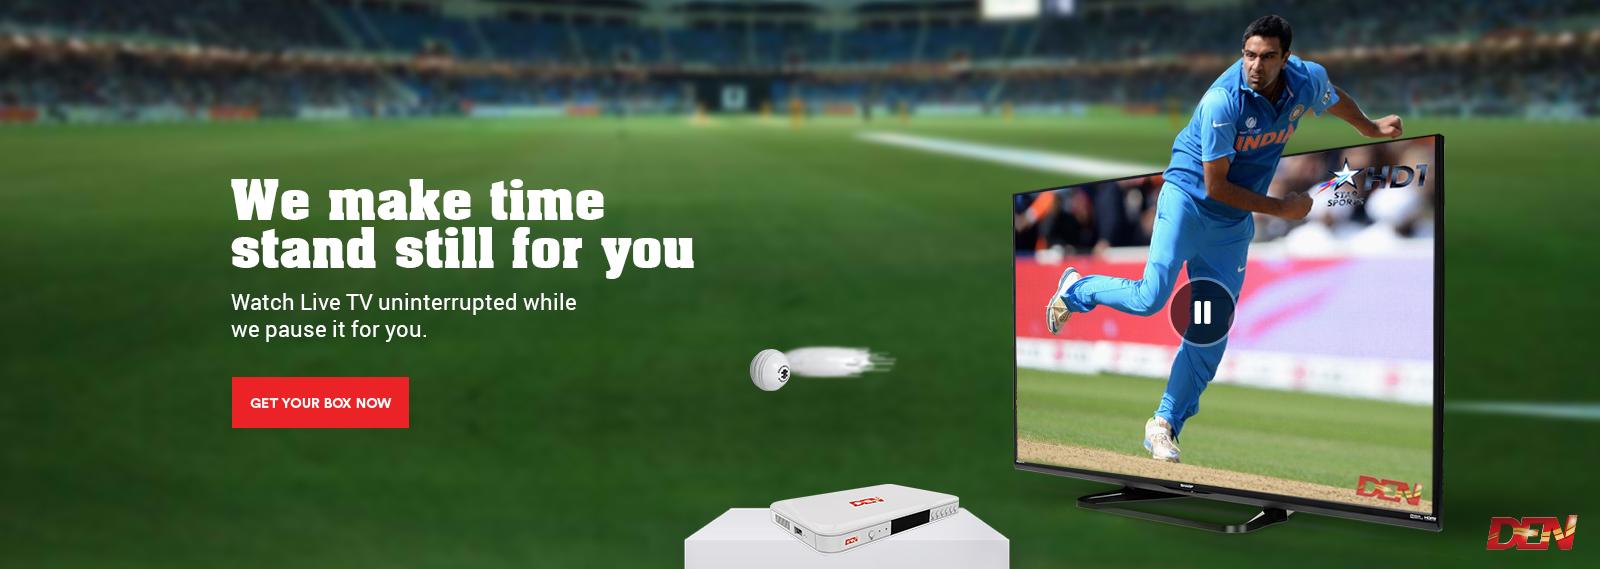 DEN Brand Entertainment - Cable Service provider